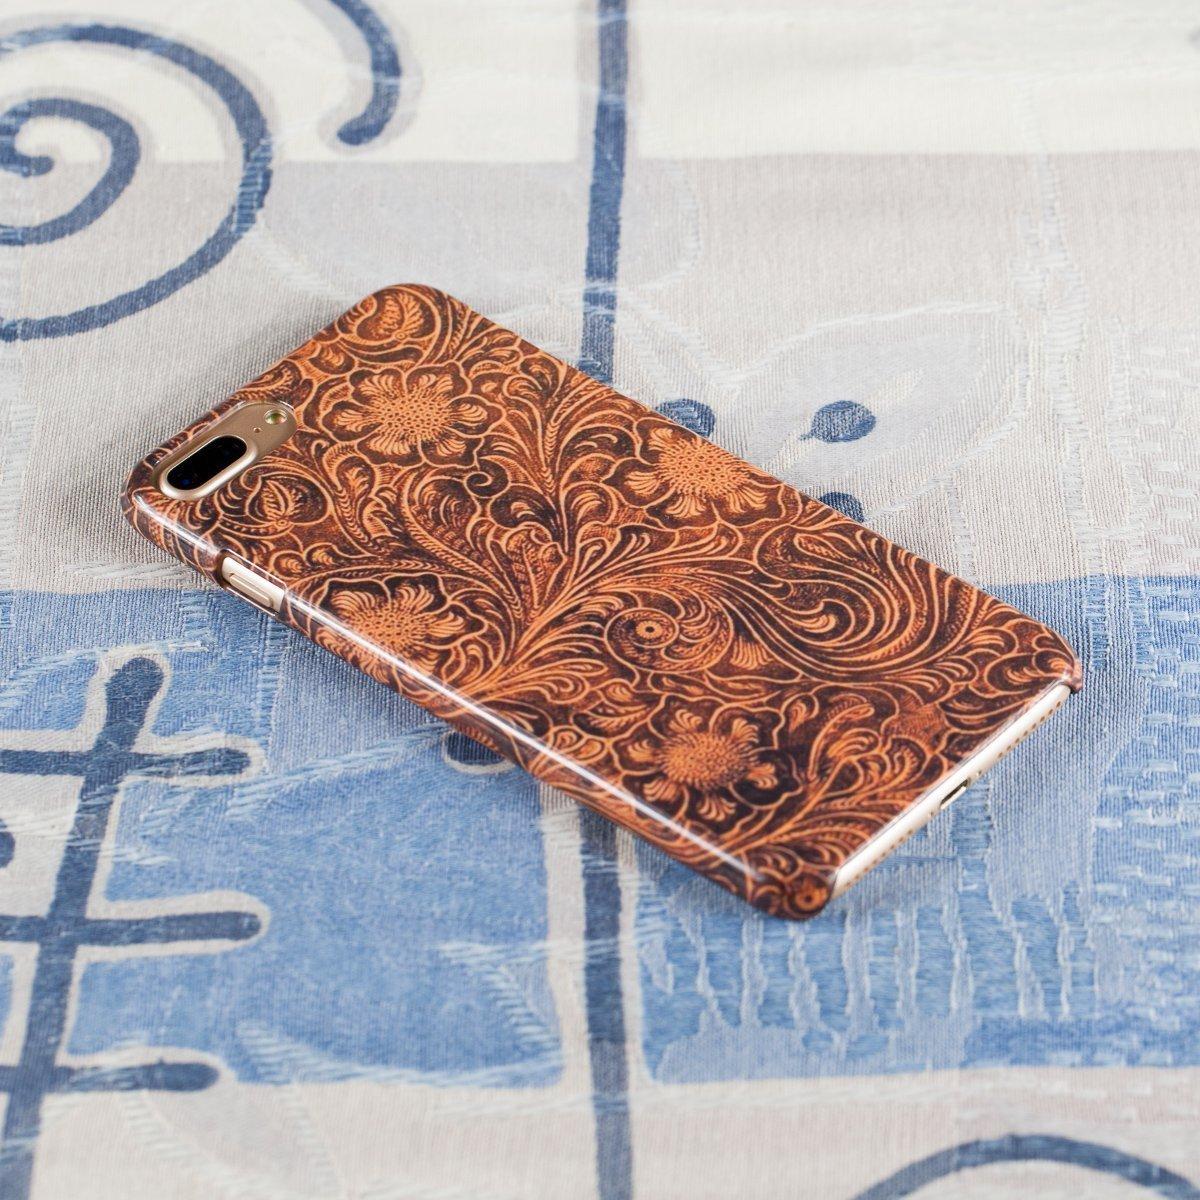 Slim Case for iPhone 7 Plus, 8 Plus. Tooled Leather Look.